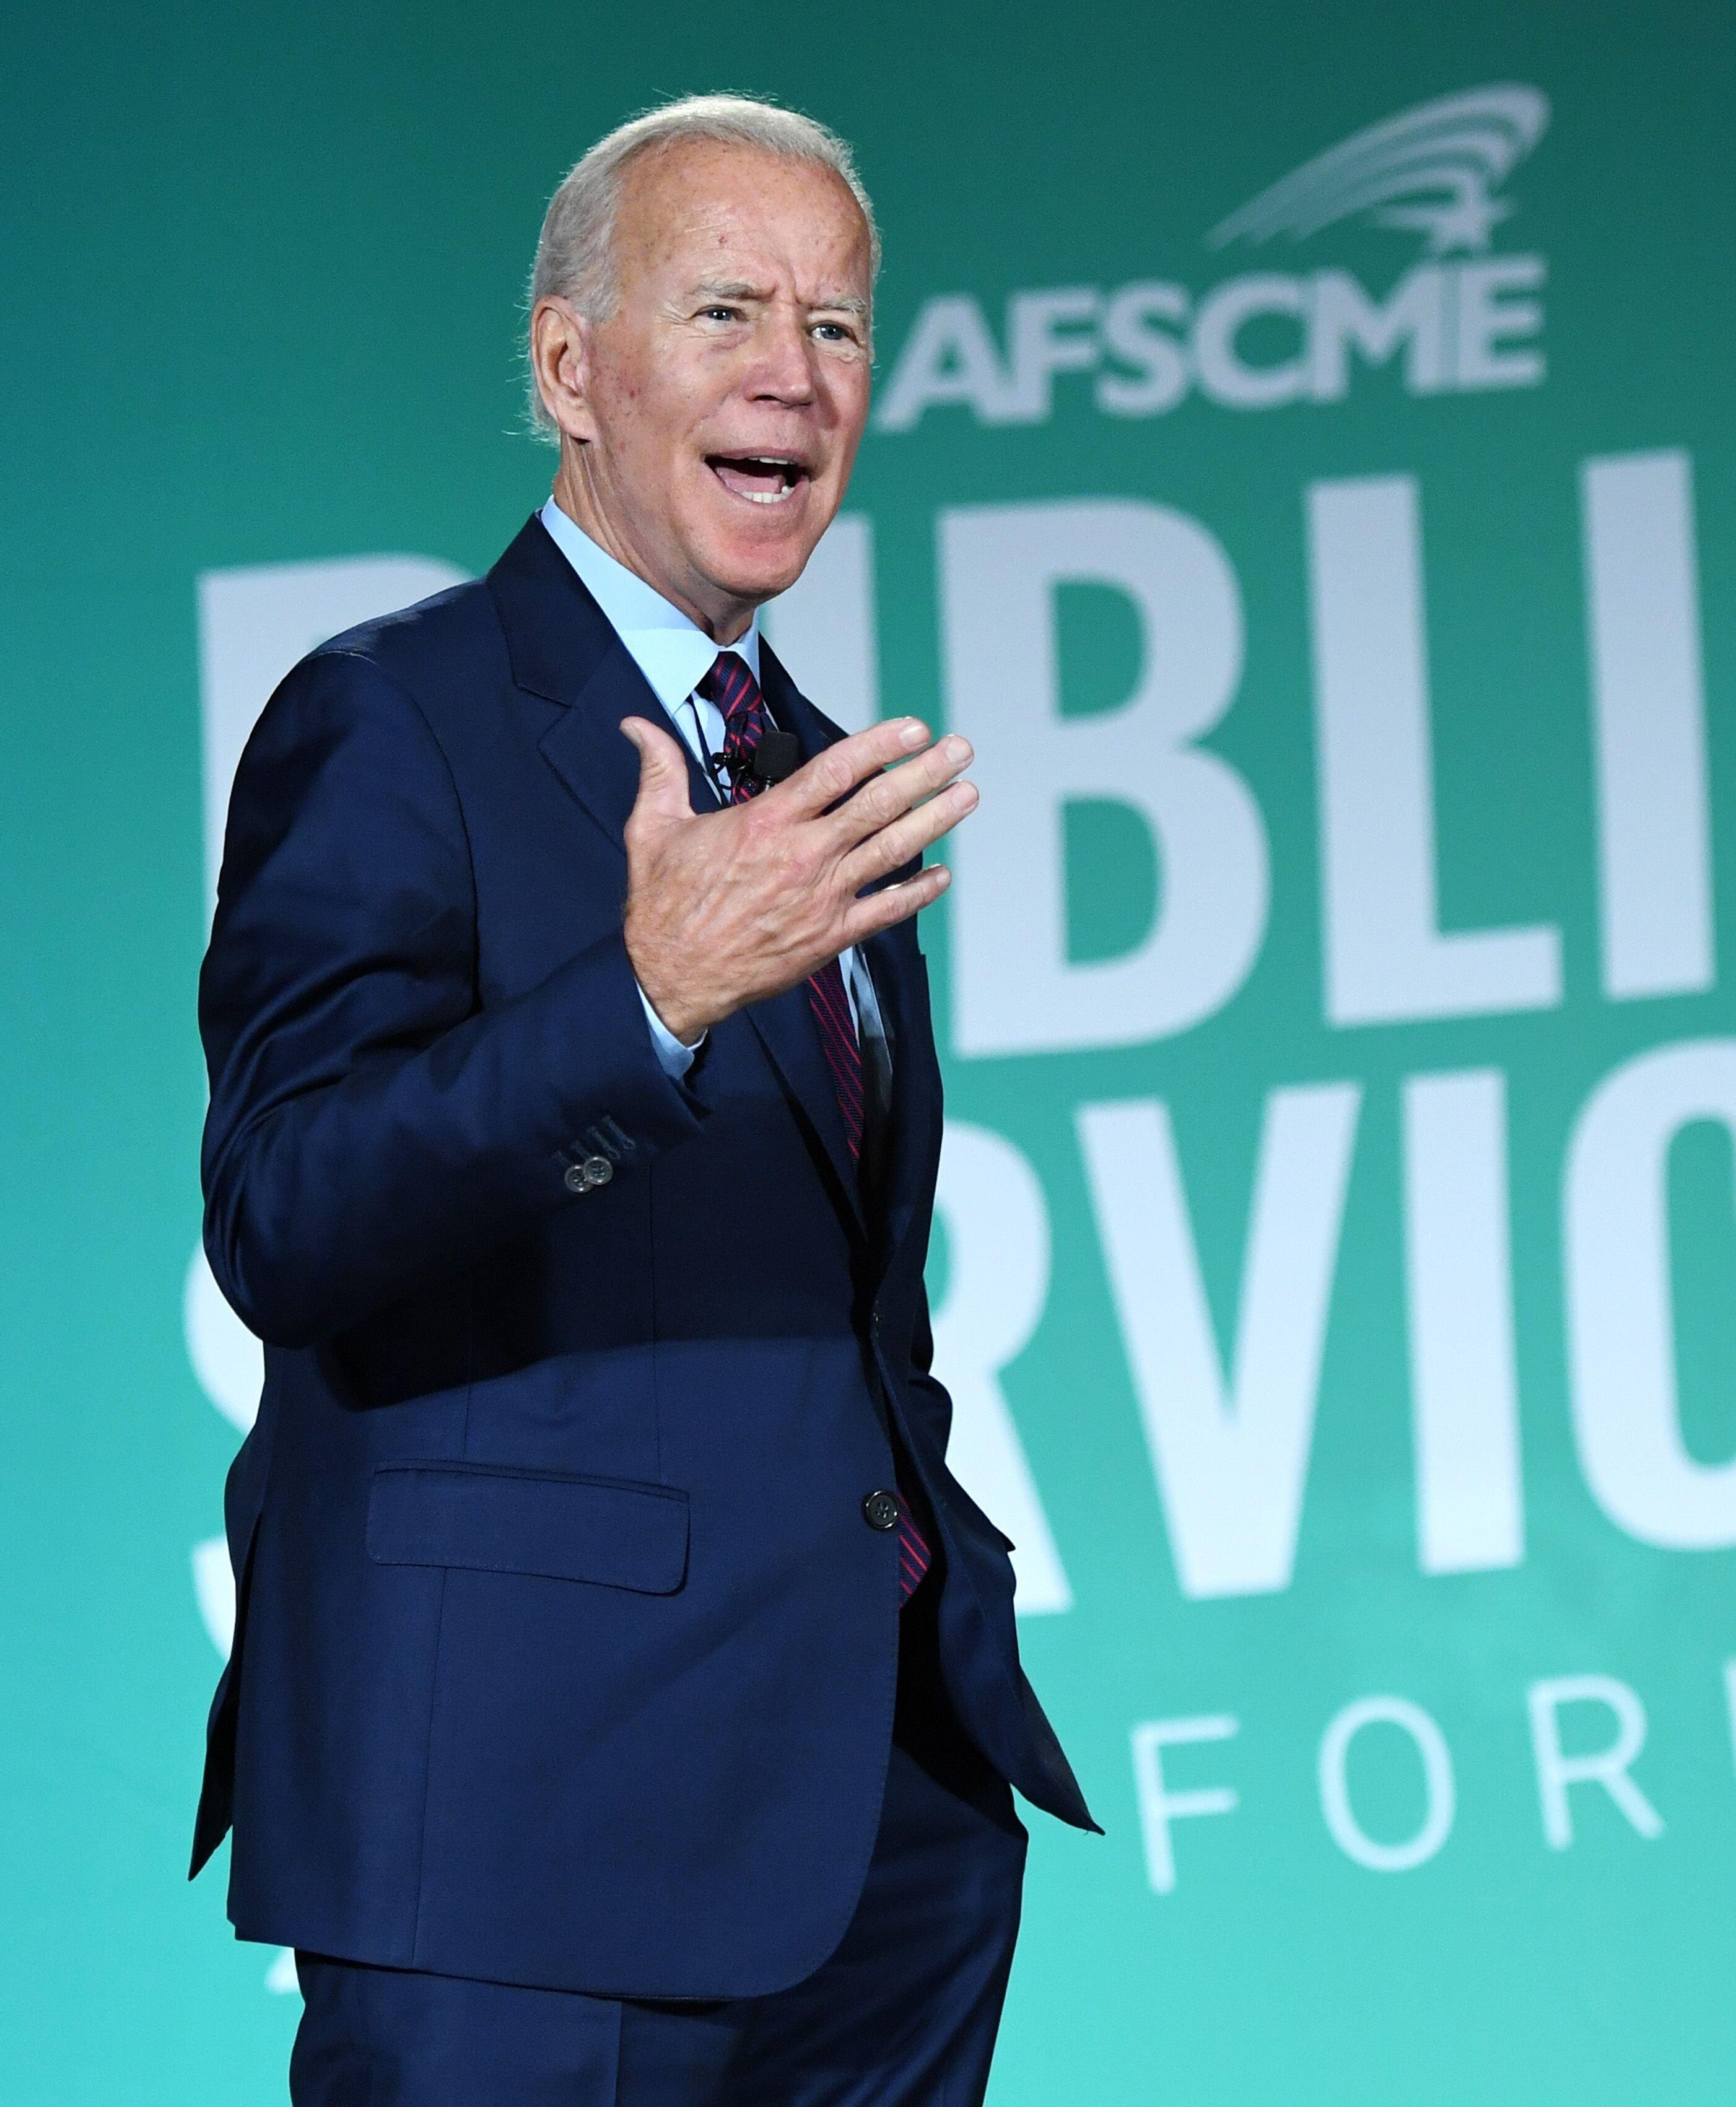 Joe Biden speaking at the AFSCME forum. | Source: Getty Images